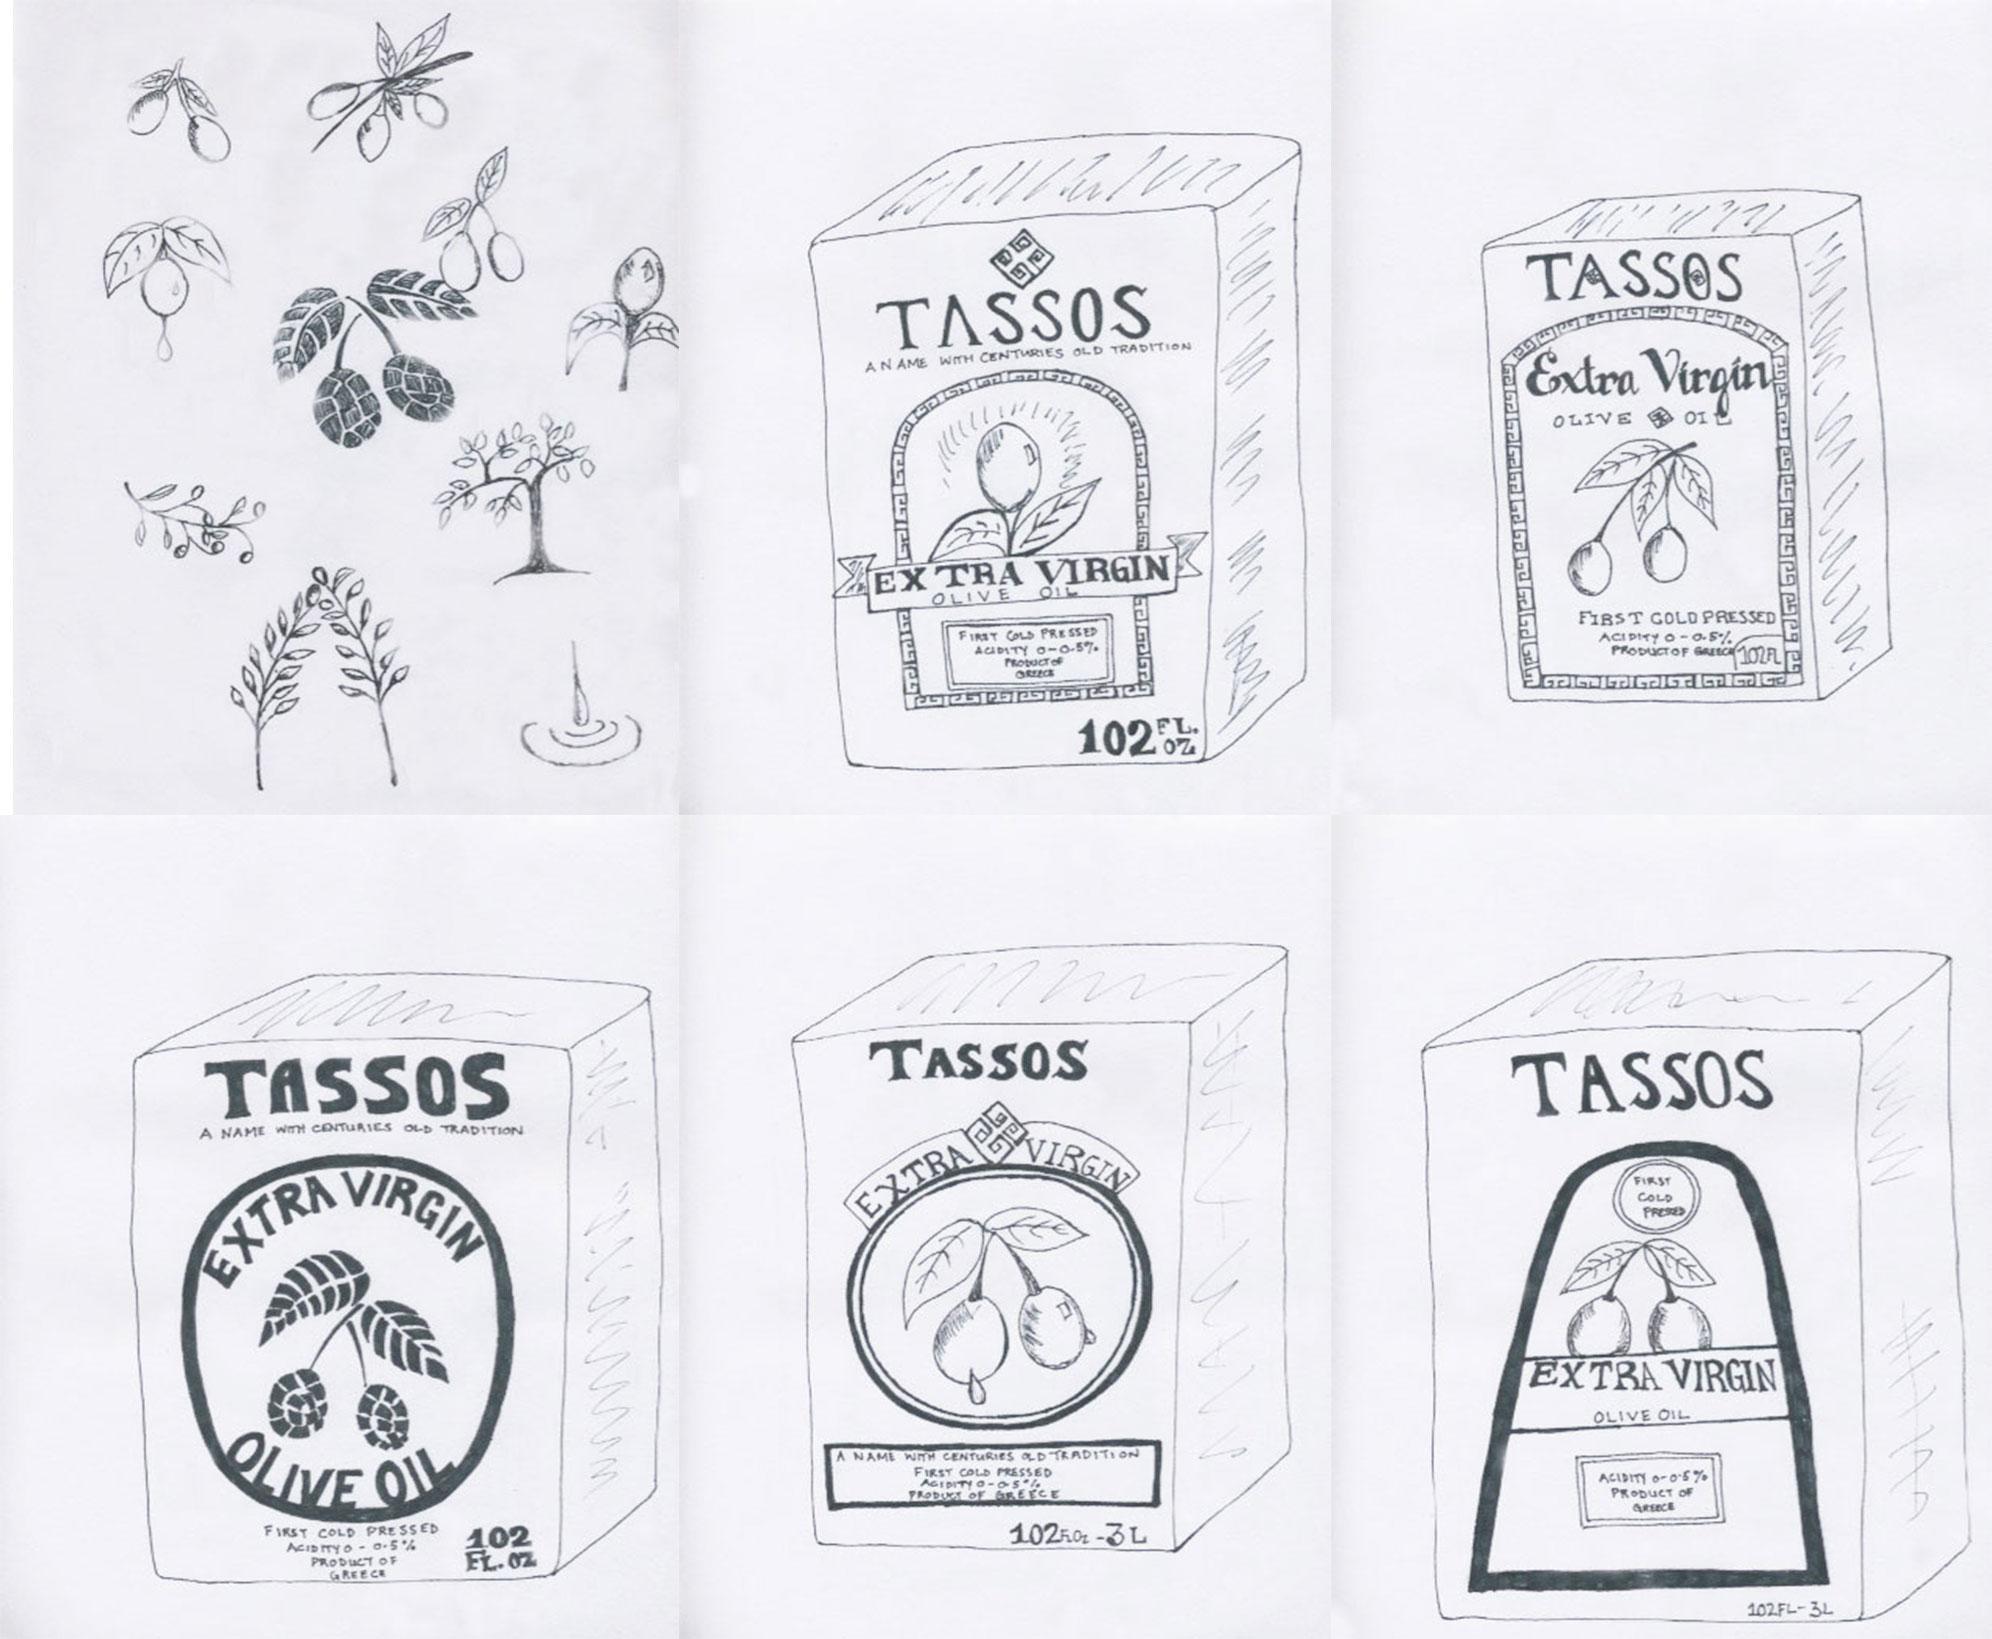 Tassos Label Design - image 5 - student project